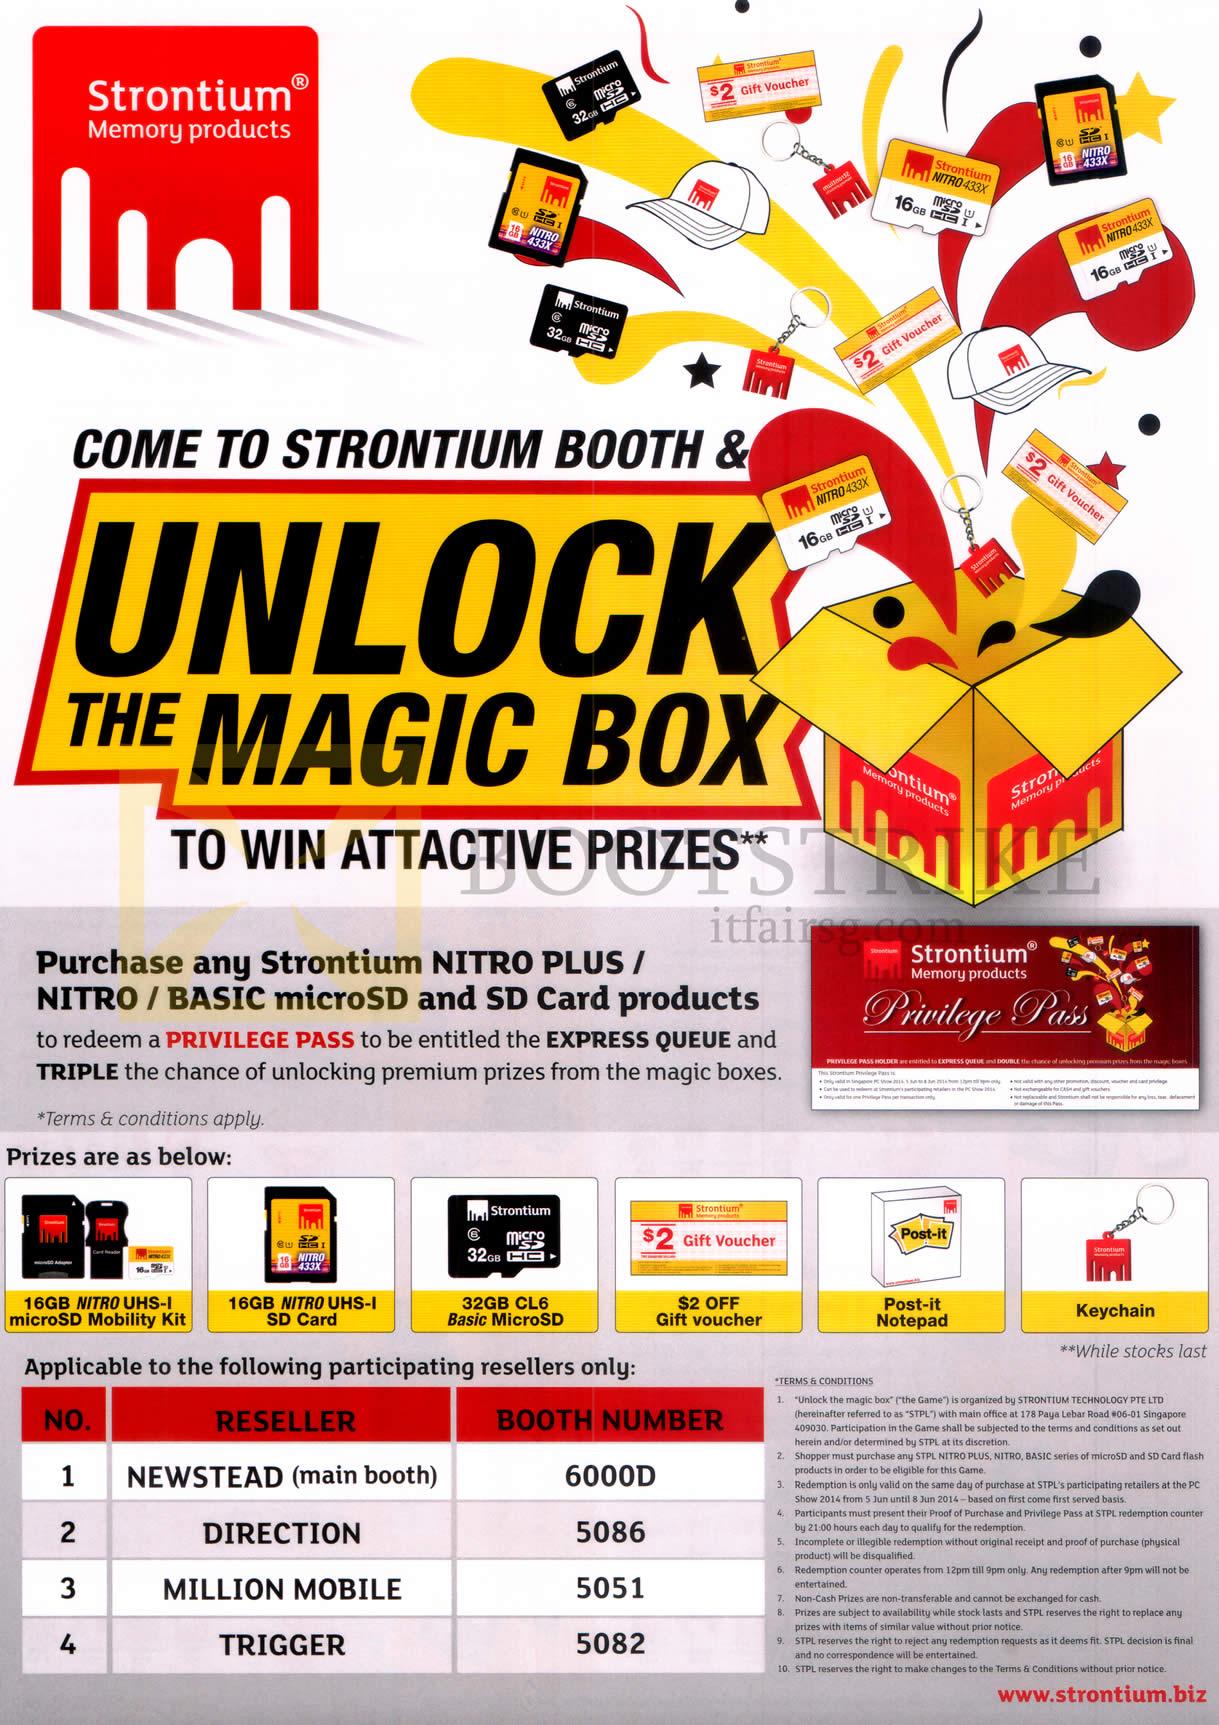 PC SHOW 2014 price list image brochure of Strontium Magic Box Win Attractive Prizes